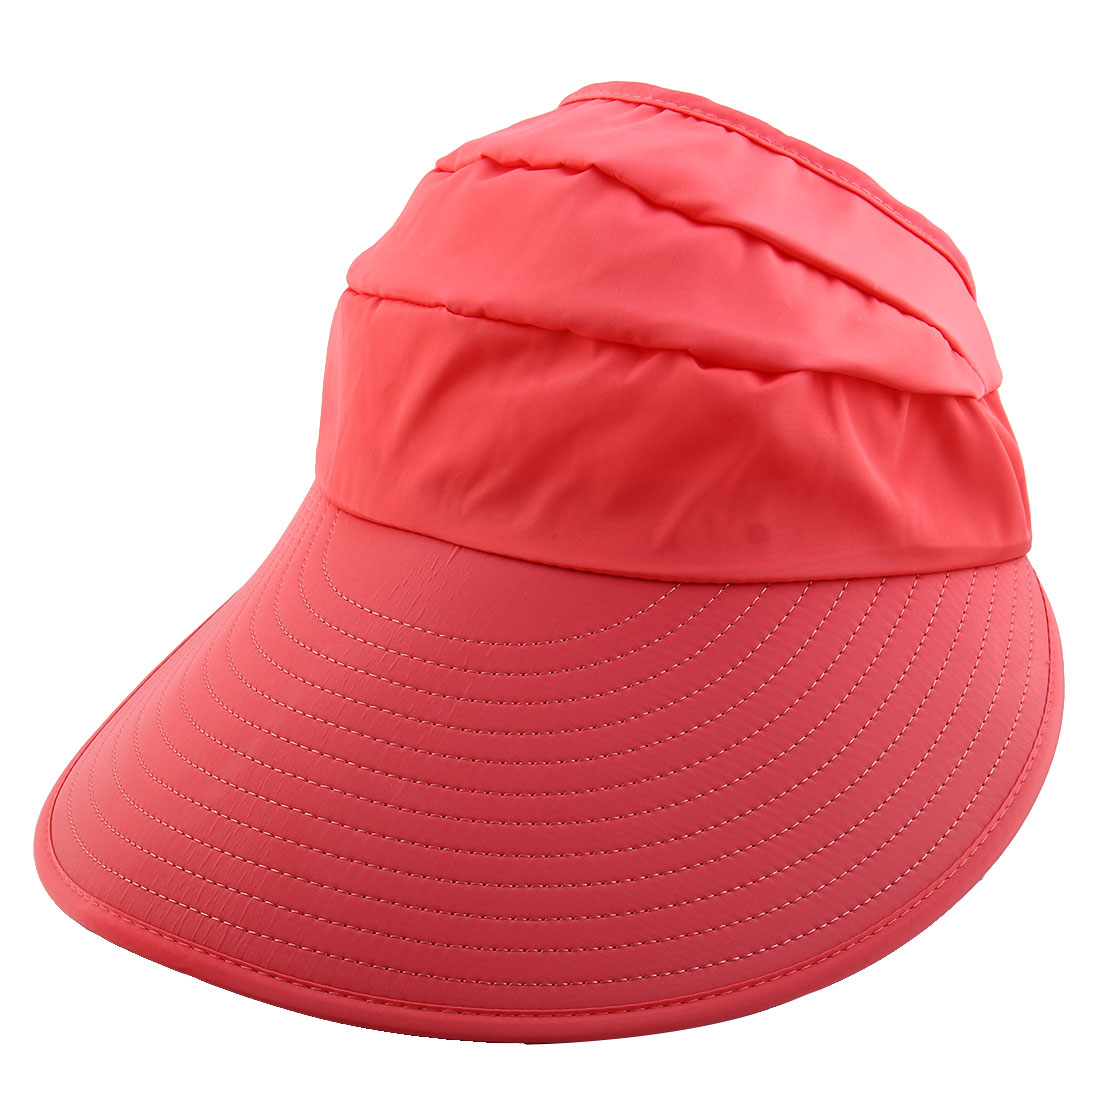 Lady Polyester Leaf Printed Summer Travel Holiday Beach Floppy Cap Sun Visor Hat Salmon Pink